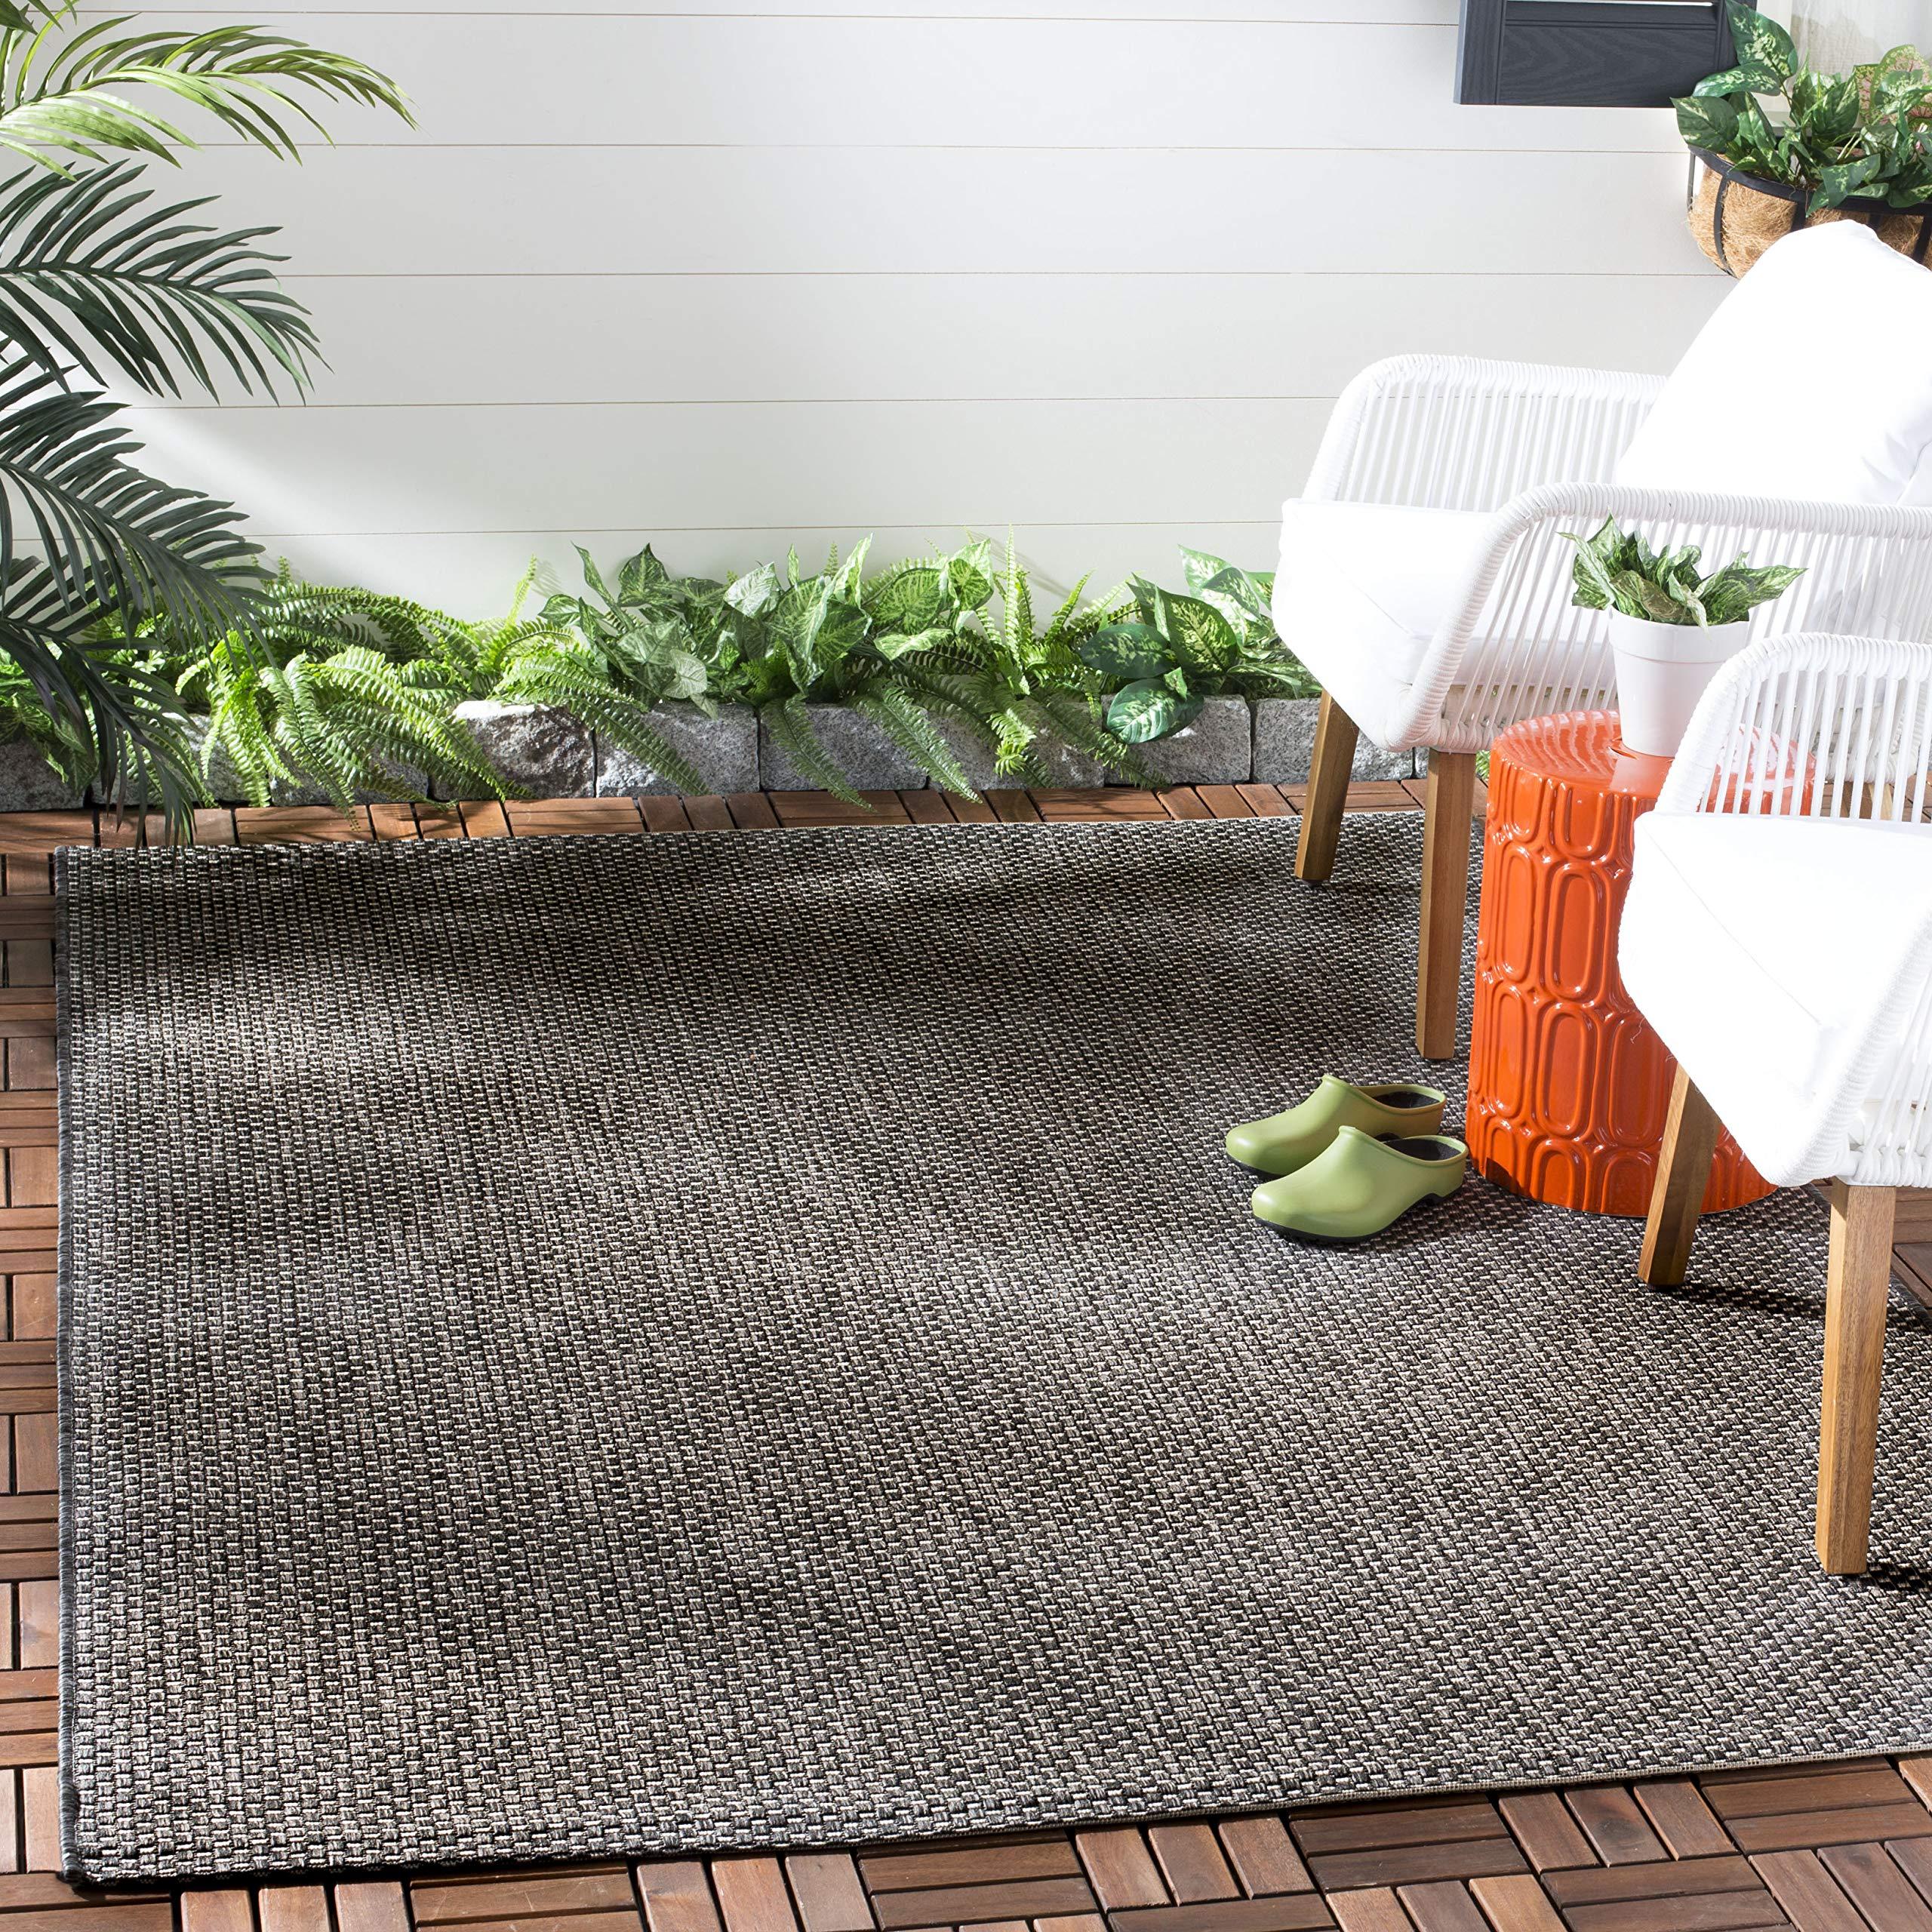 Amazon Com Safavieh Courtyard Collection Cy8521 Indoor Outdoor Non Shedding Stain Resistant Patio Backyard Area Rug 5 3 X 7 7 Black Beige Furniture Decor